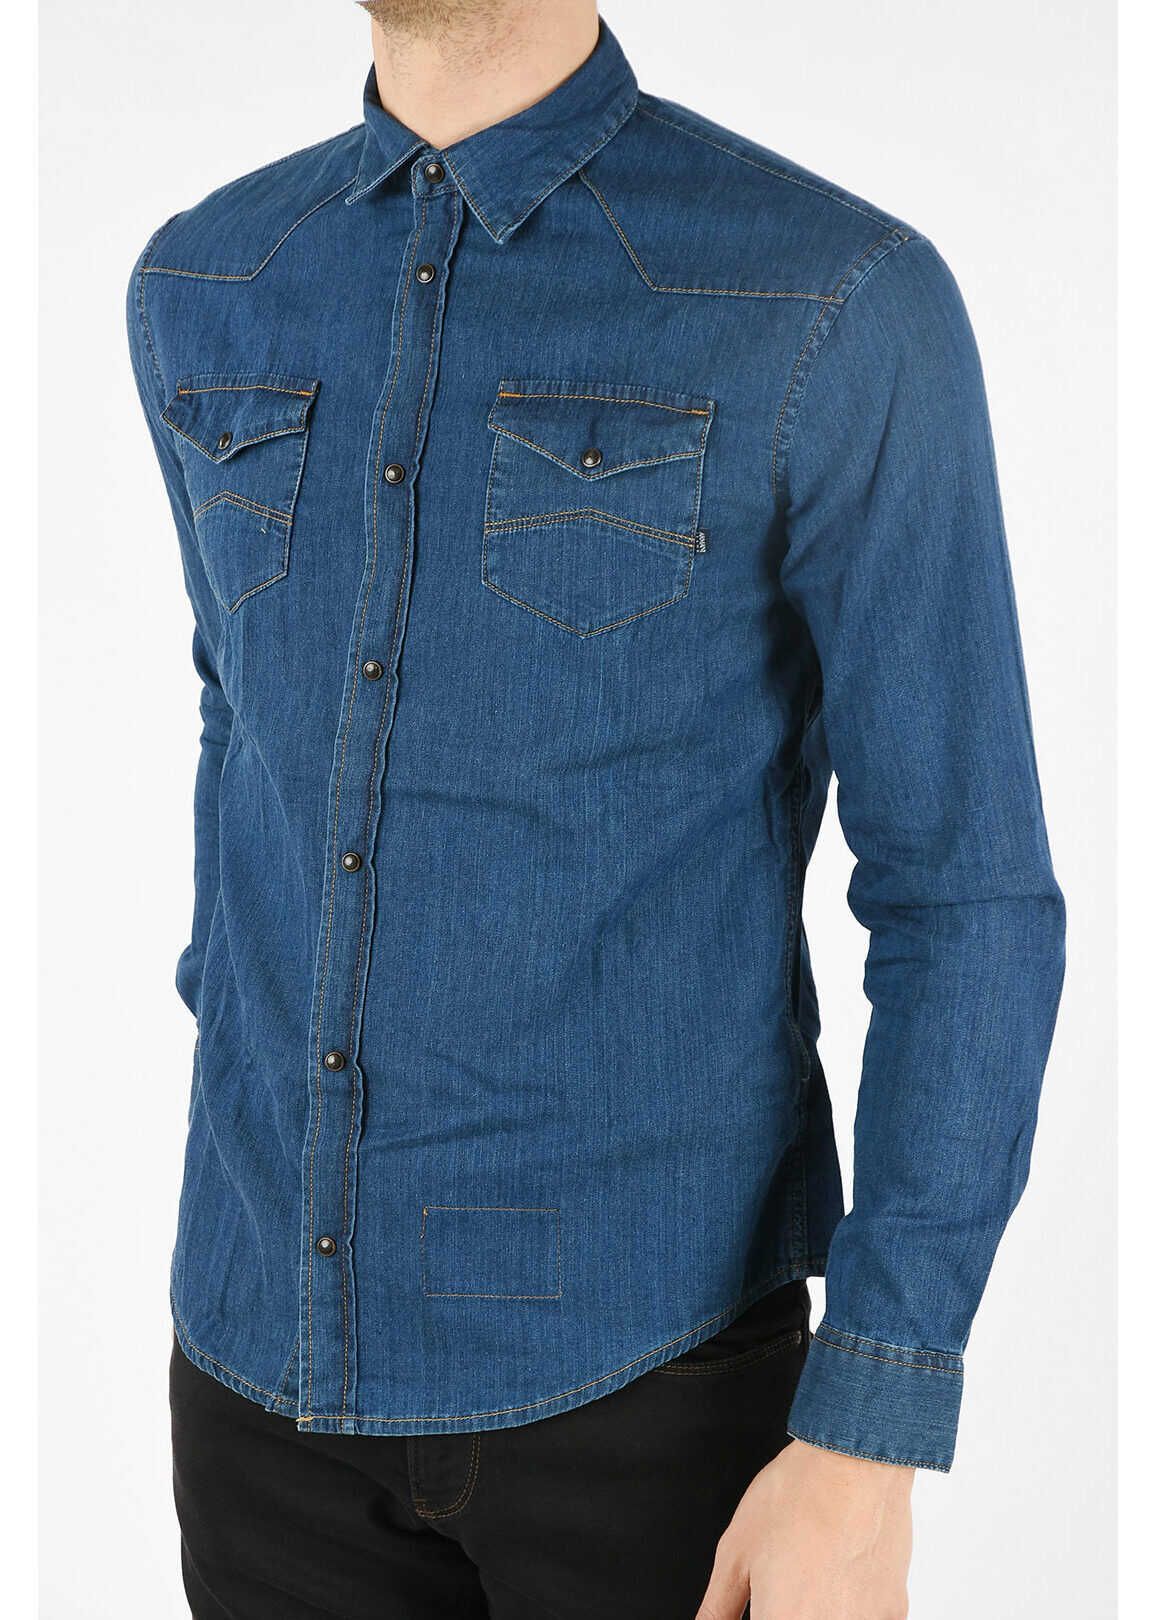 Armani ARMANI JEANS Denim Shirt BLUE imagine